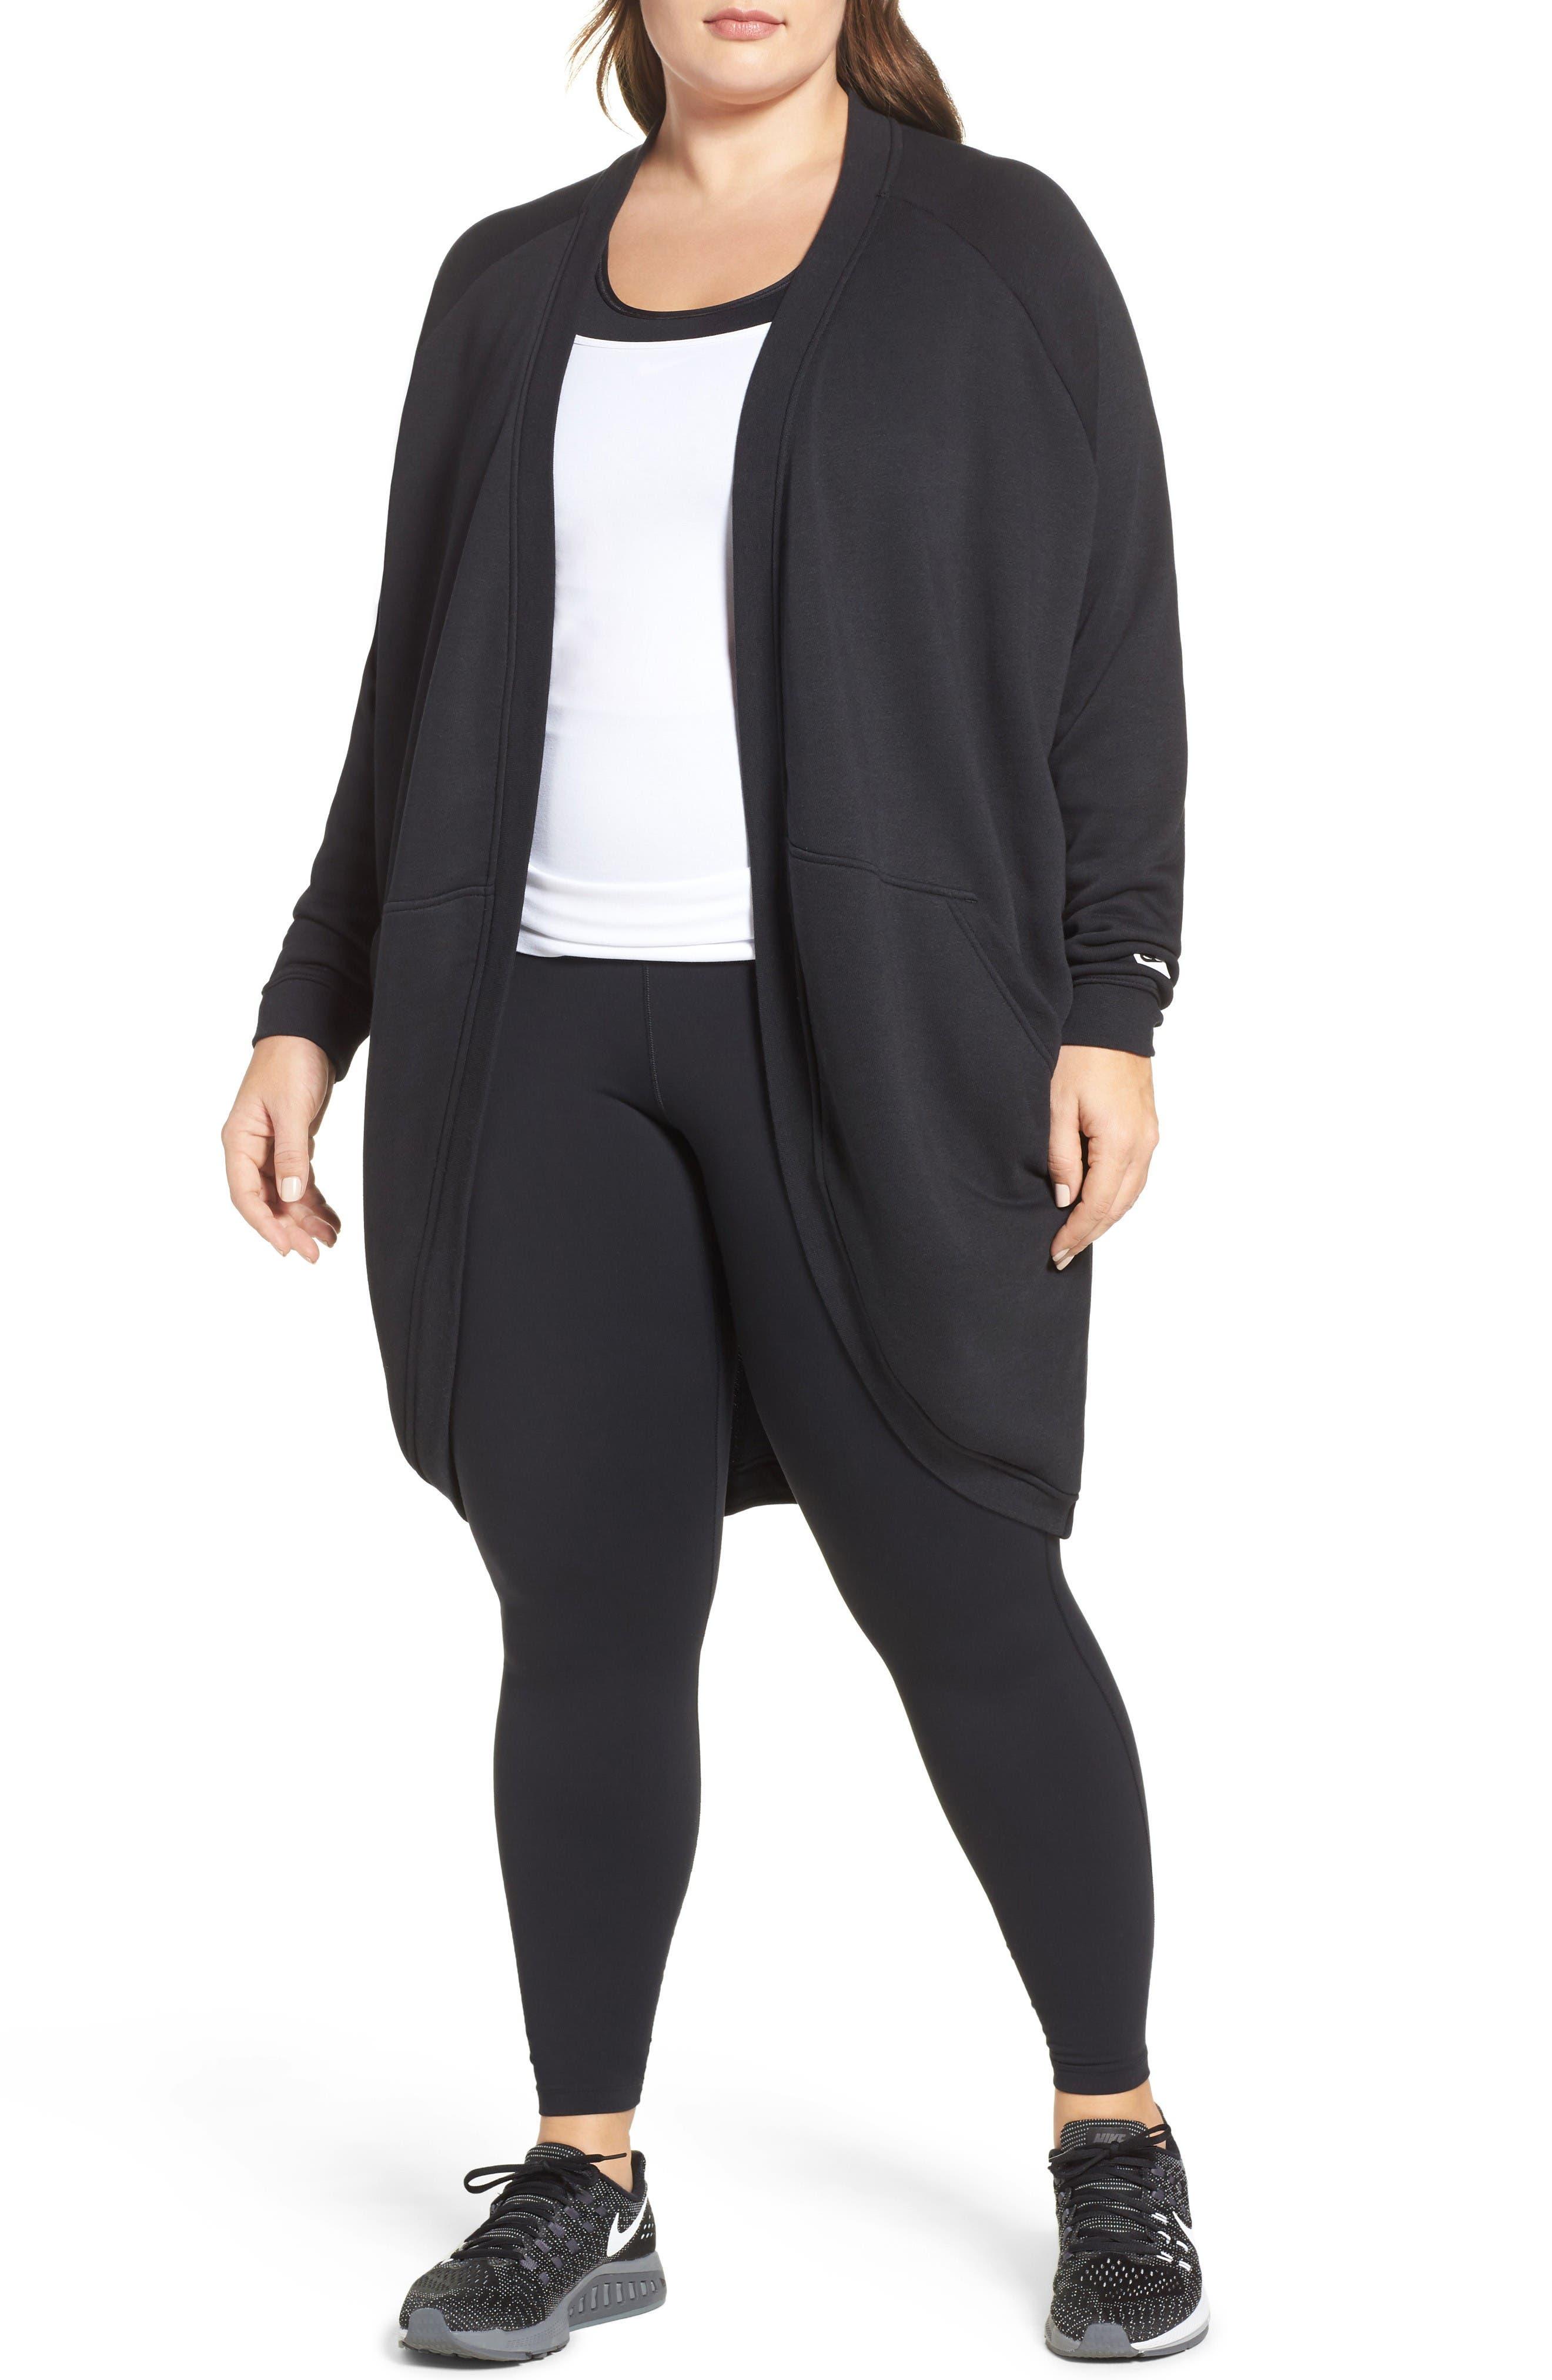 Nike Sportswear Modern Cardigan (Plus Size)